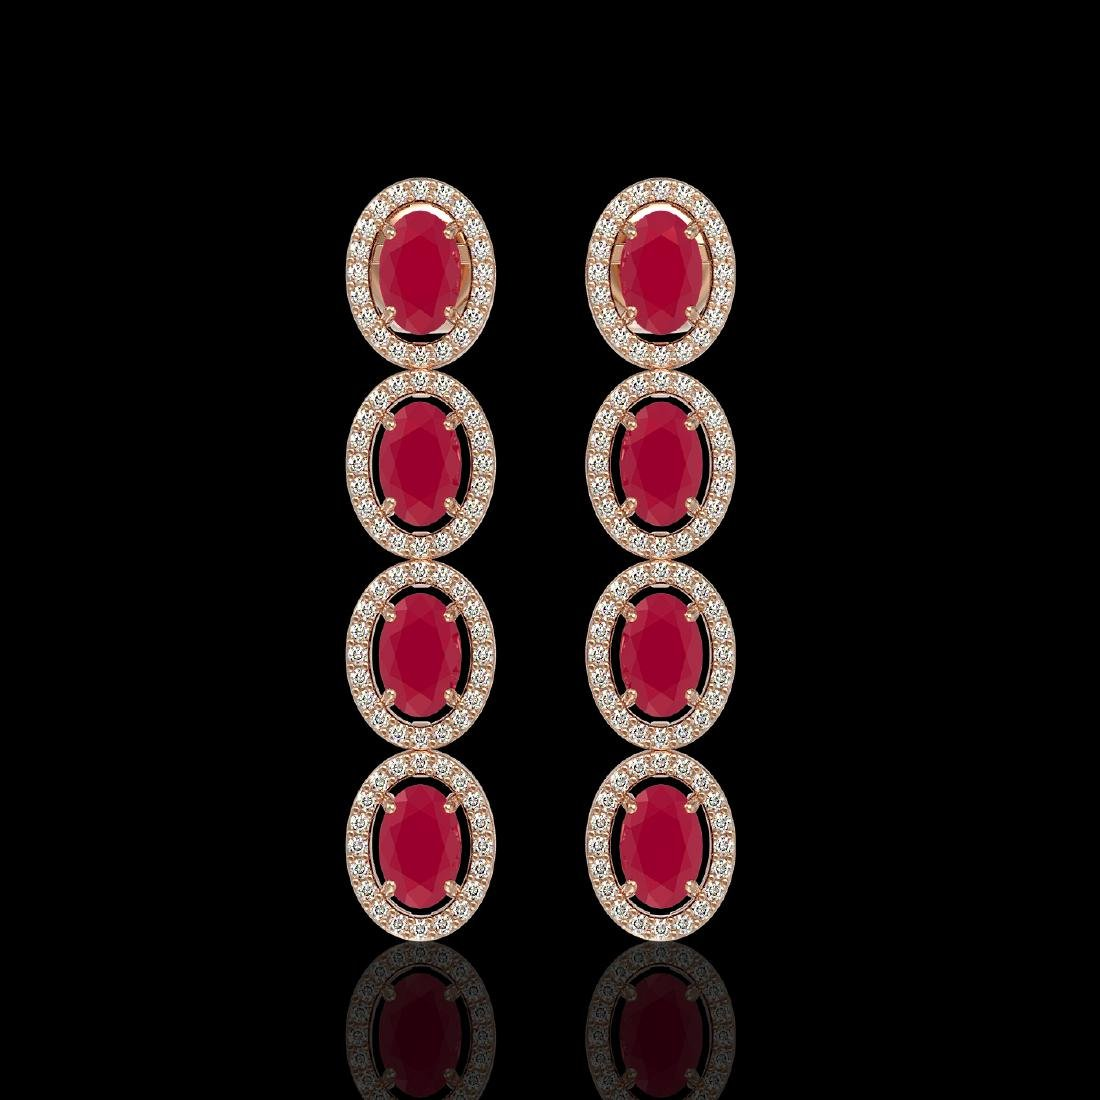 6.47 CTW Ruby & Diamond Halo Earrings 10K Rose Gold